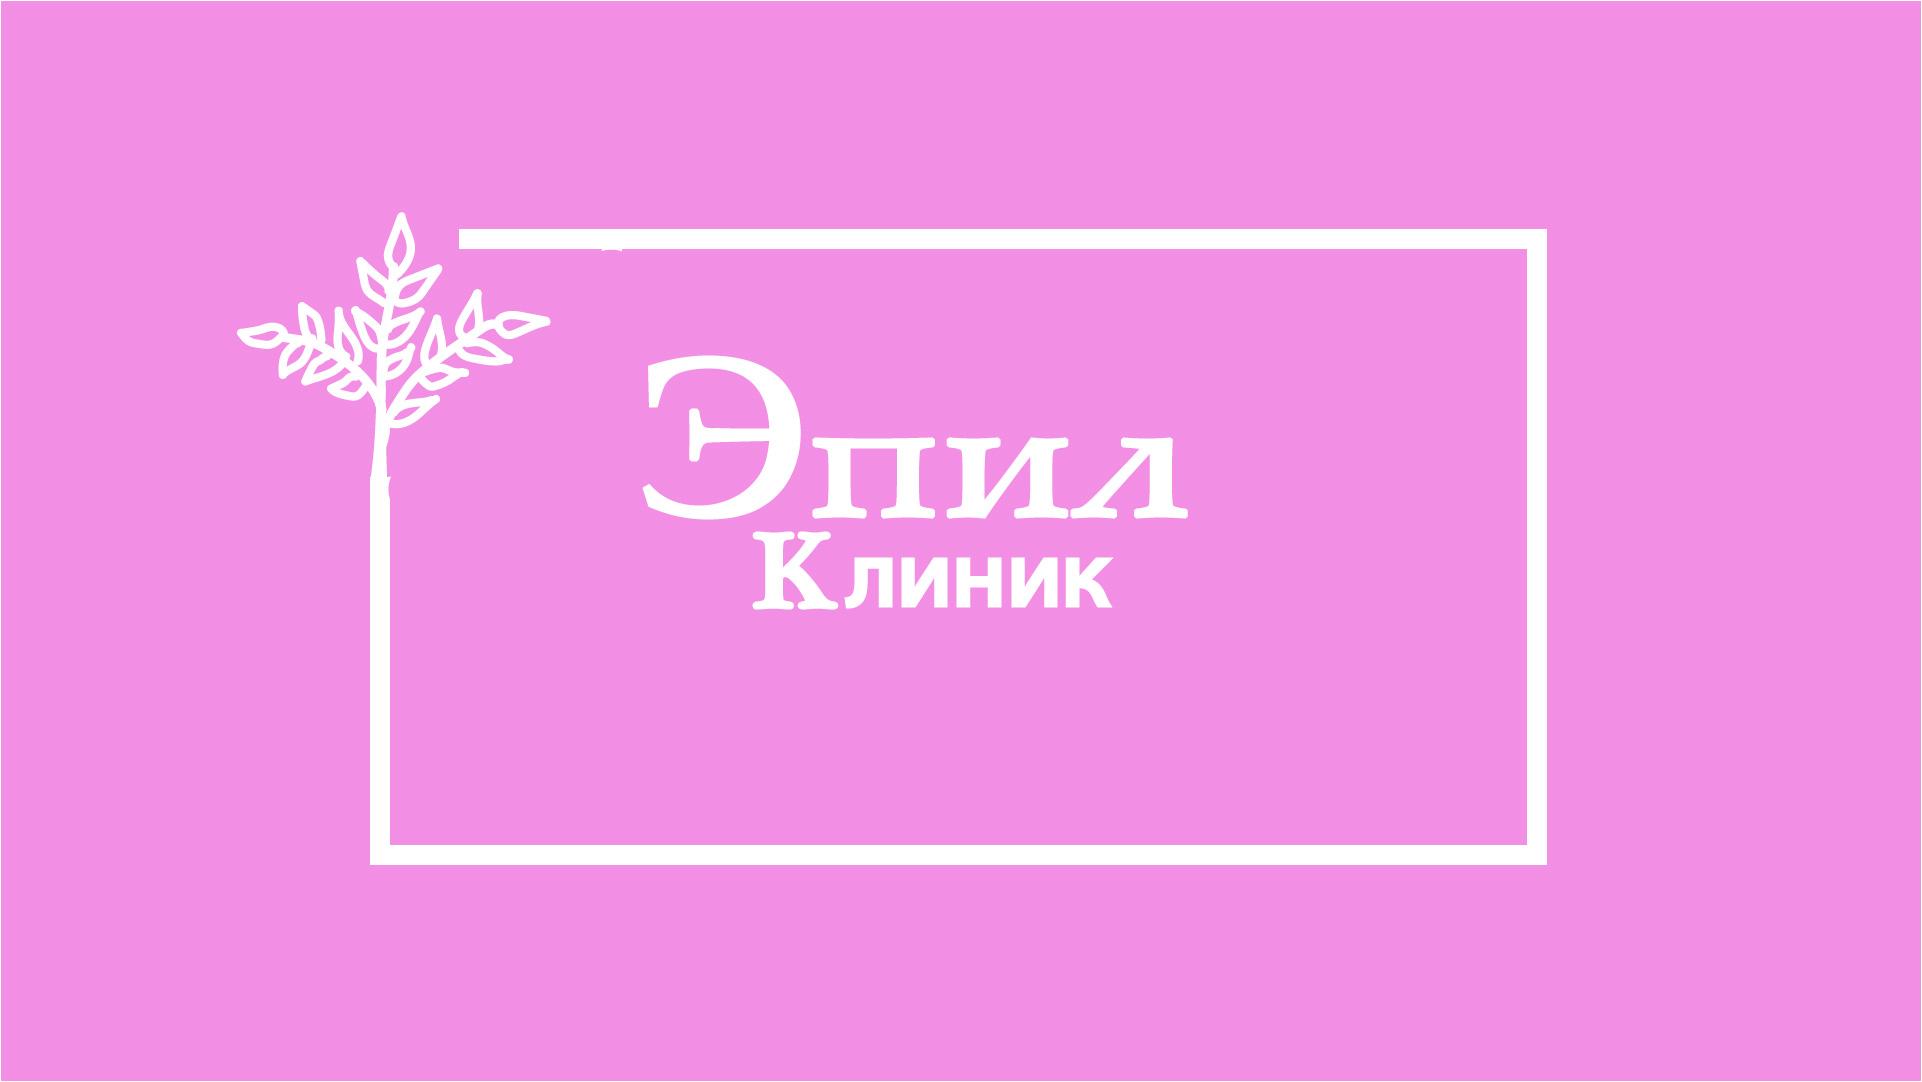 Логотип , фирменный стиль  фото f_9345e1f093daaa96.jpg